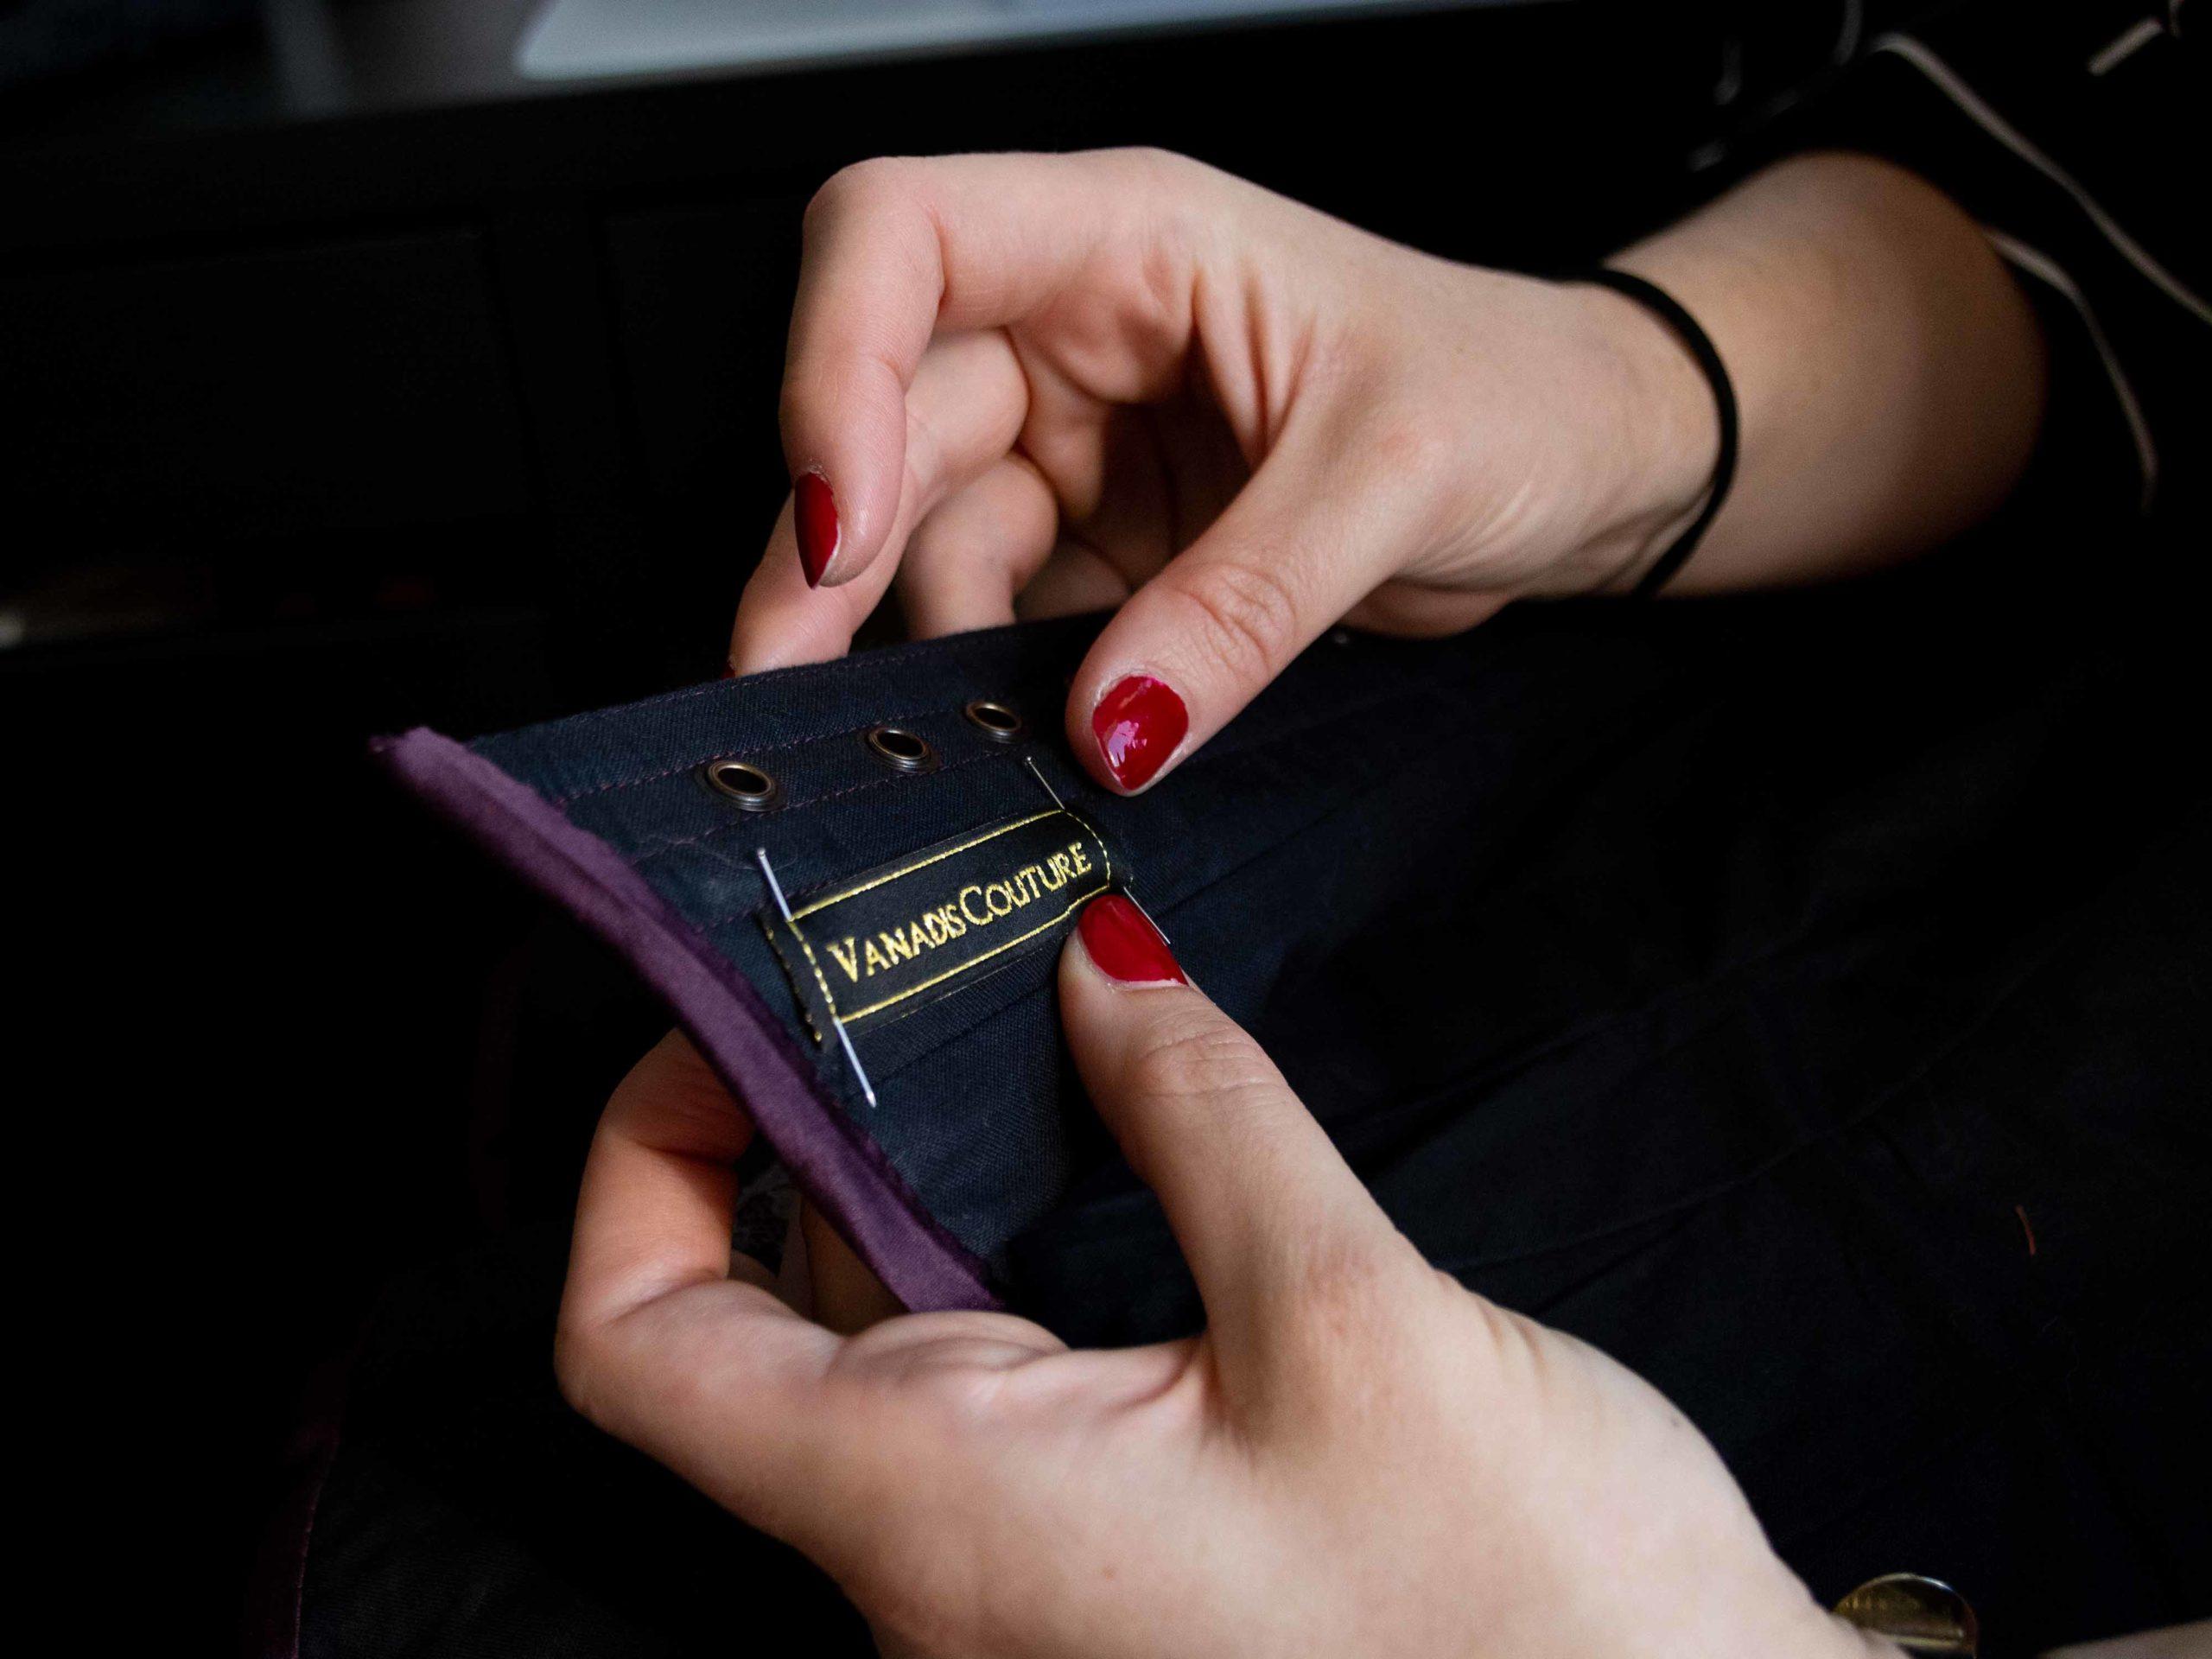 Vanadis Couture